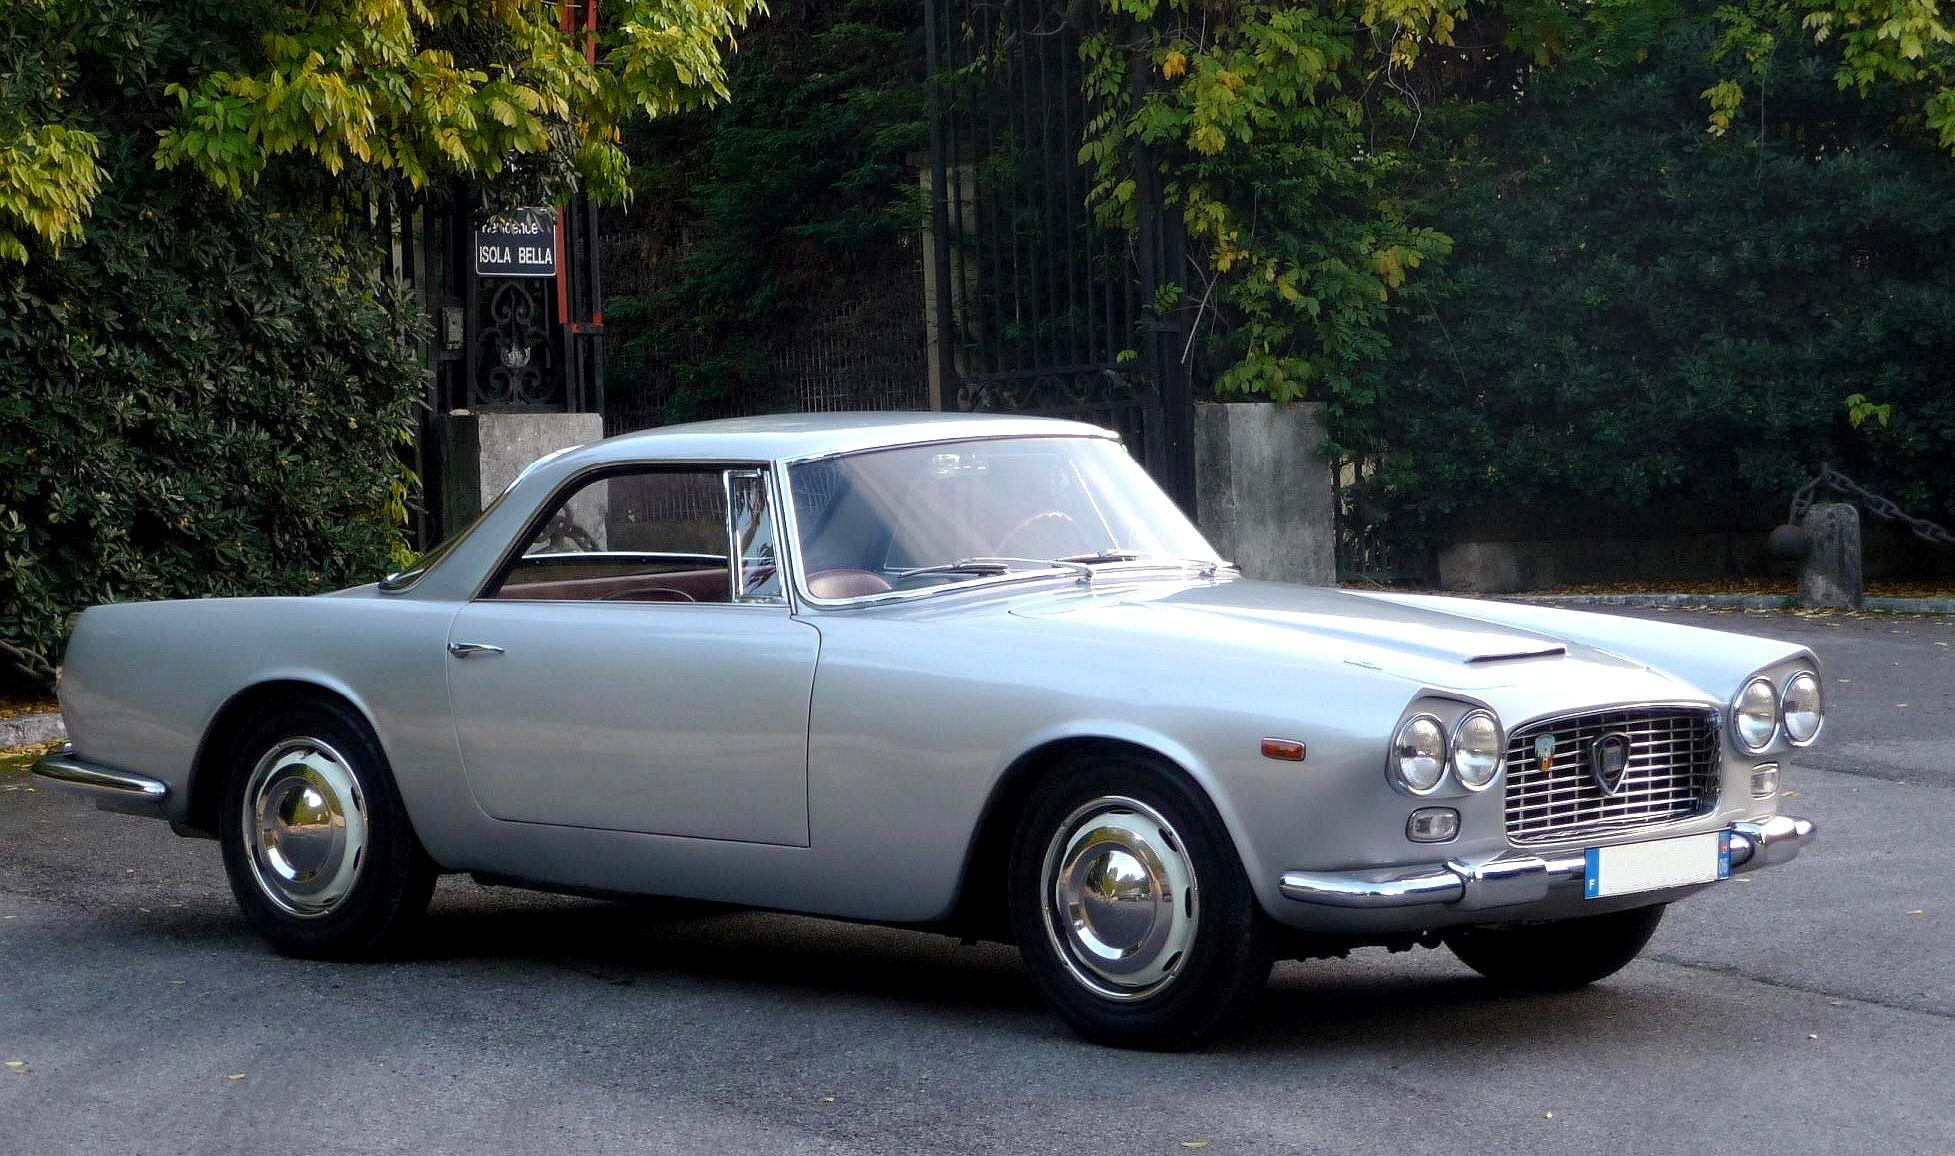 I Think Vintage Lancia Would Suit Me Just Fine